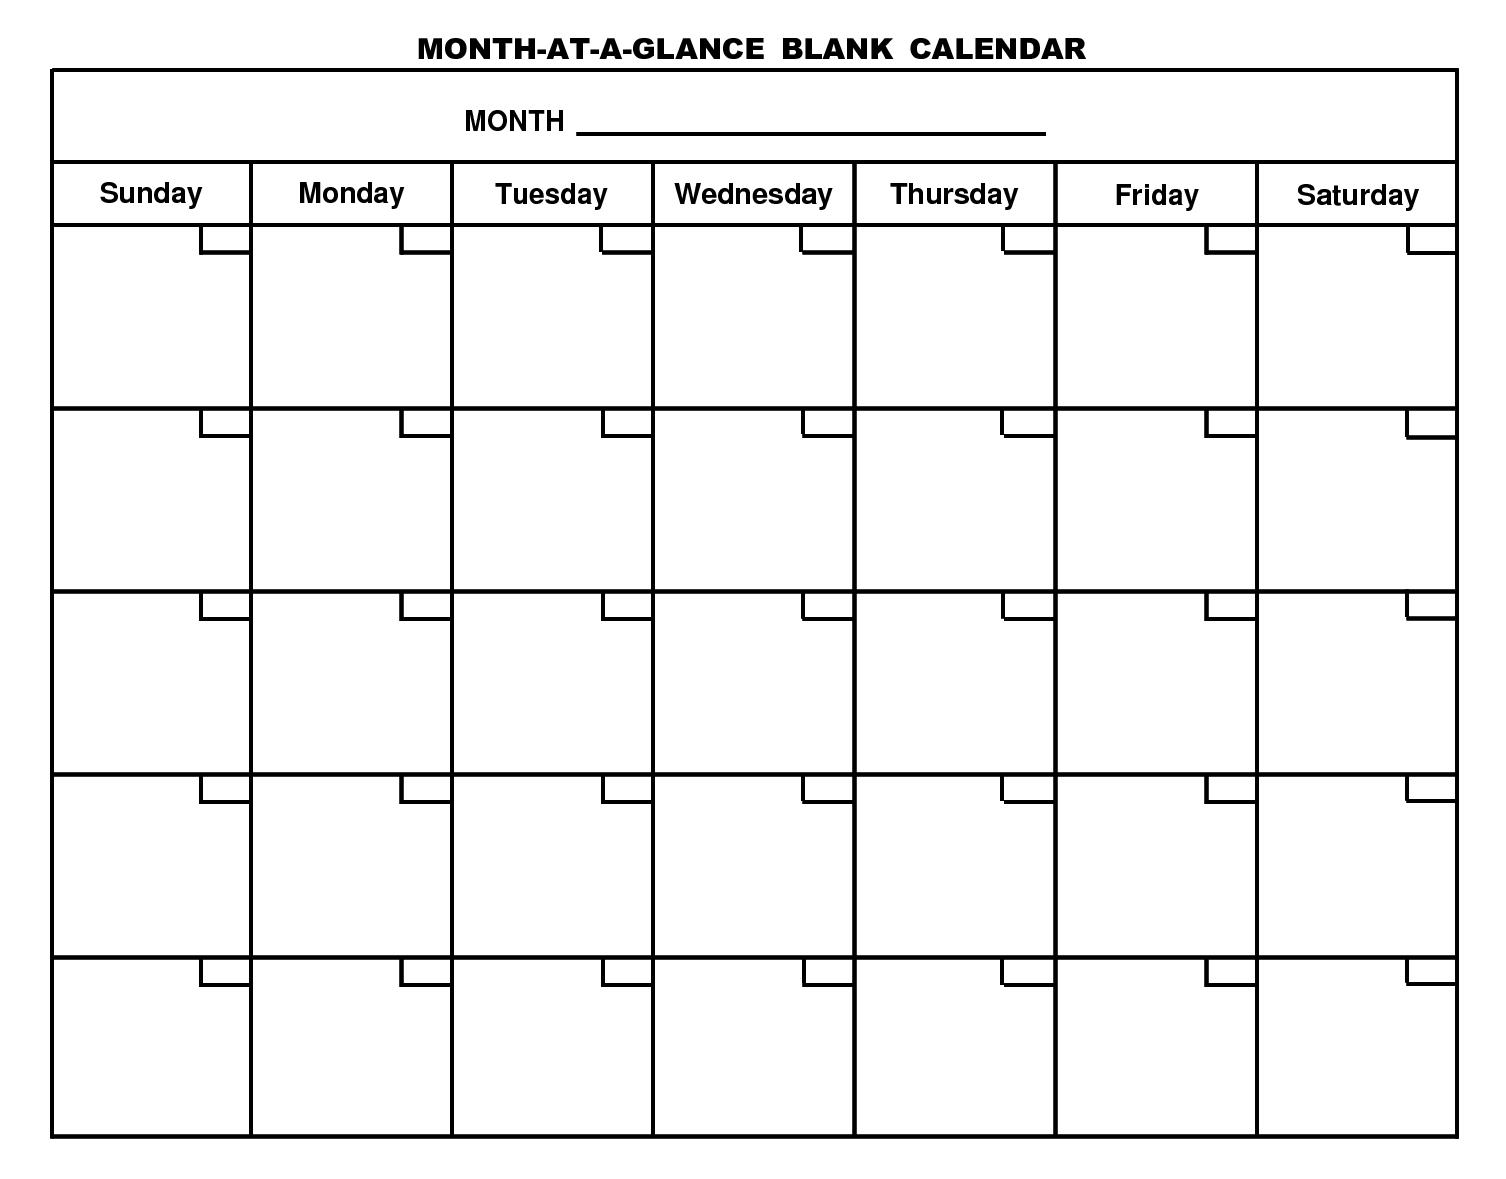 Blank Template For 30 Days | Example Calendar Printable 30 Day Blank Calendar